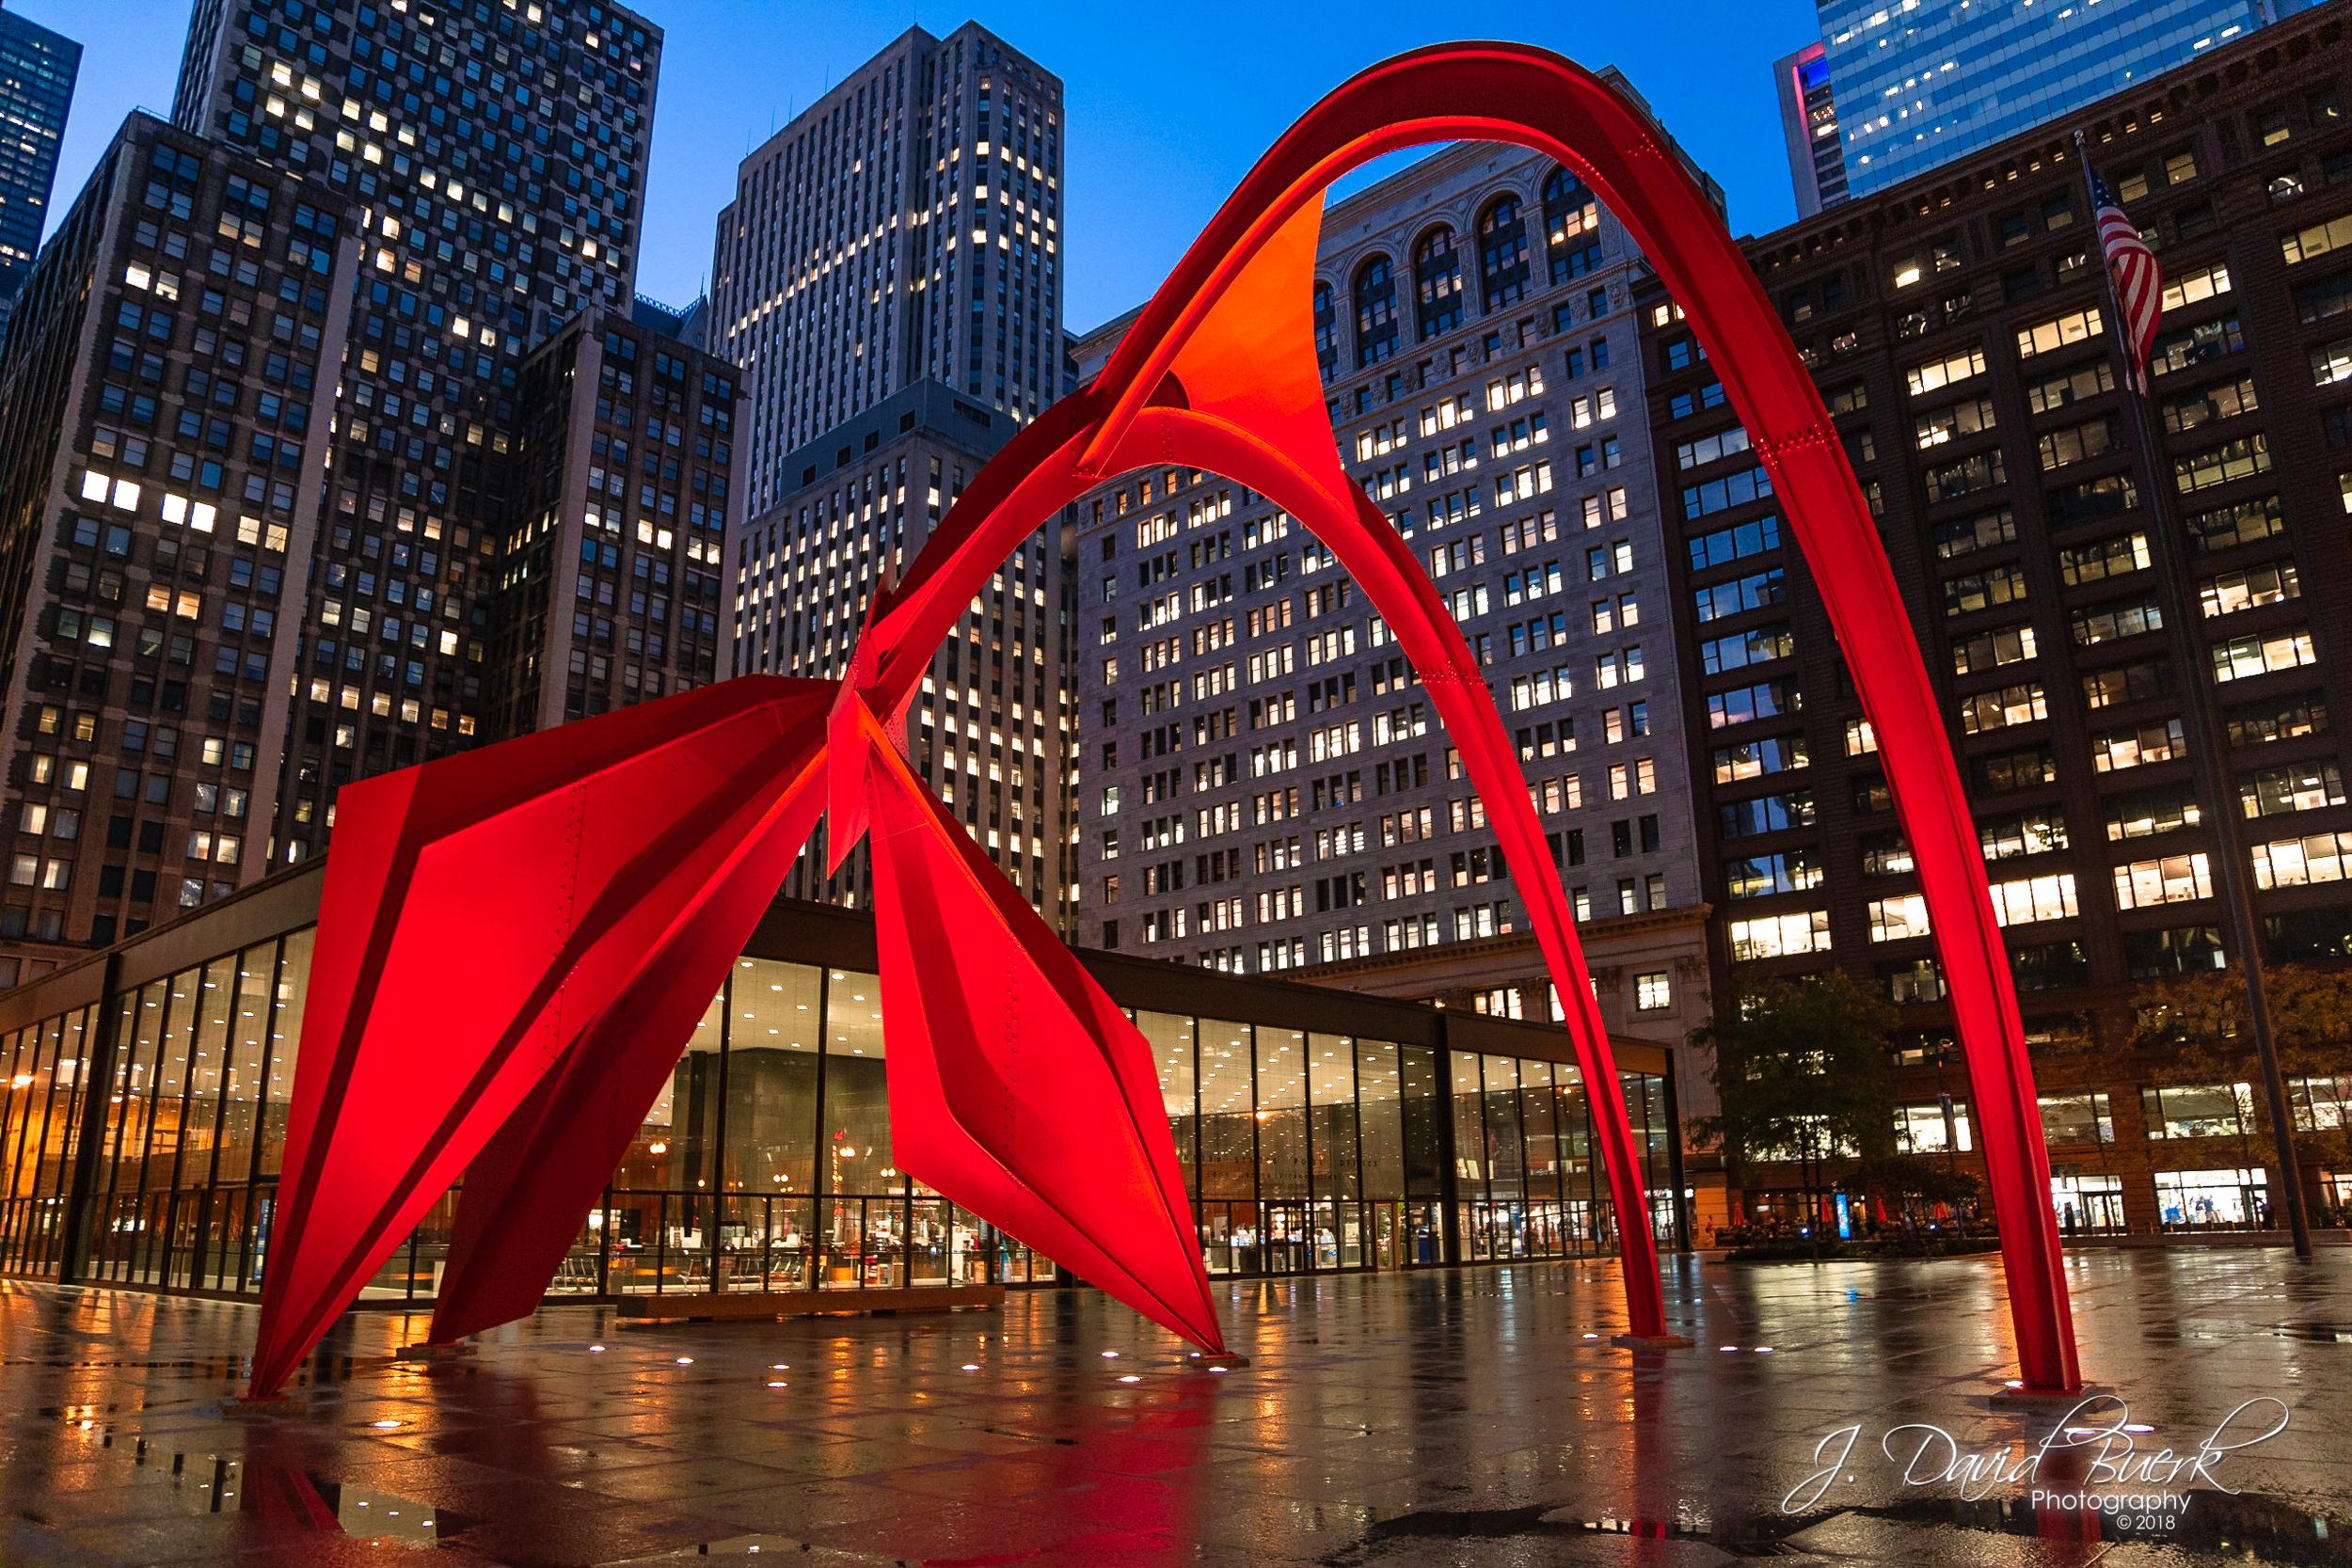 Alexander Calder's  Flamingo  in Chicago, Illinois.